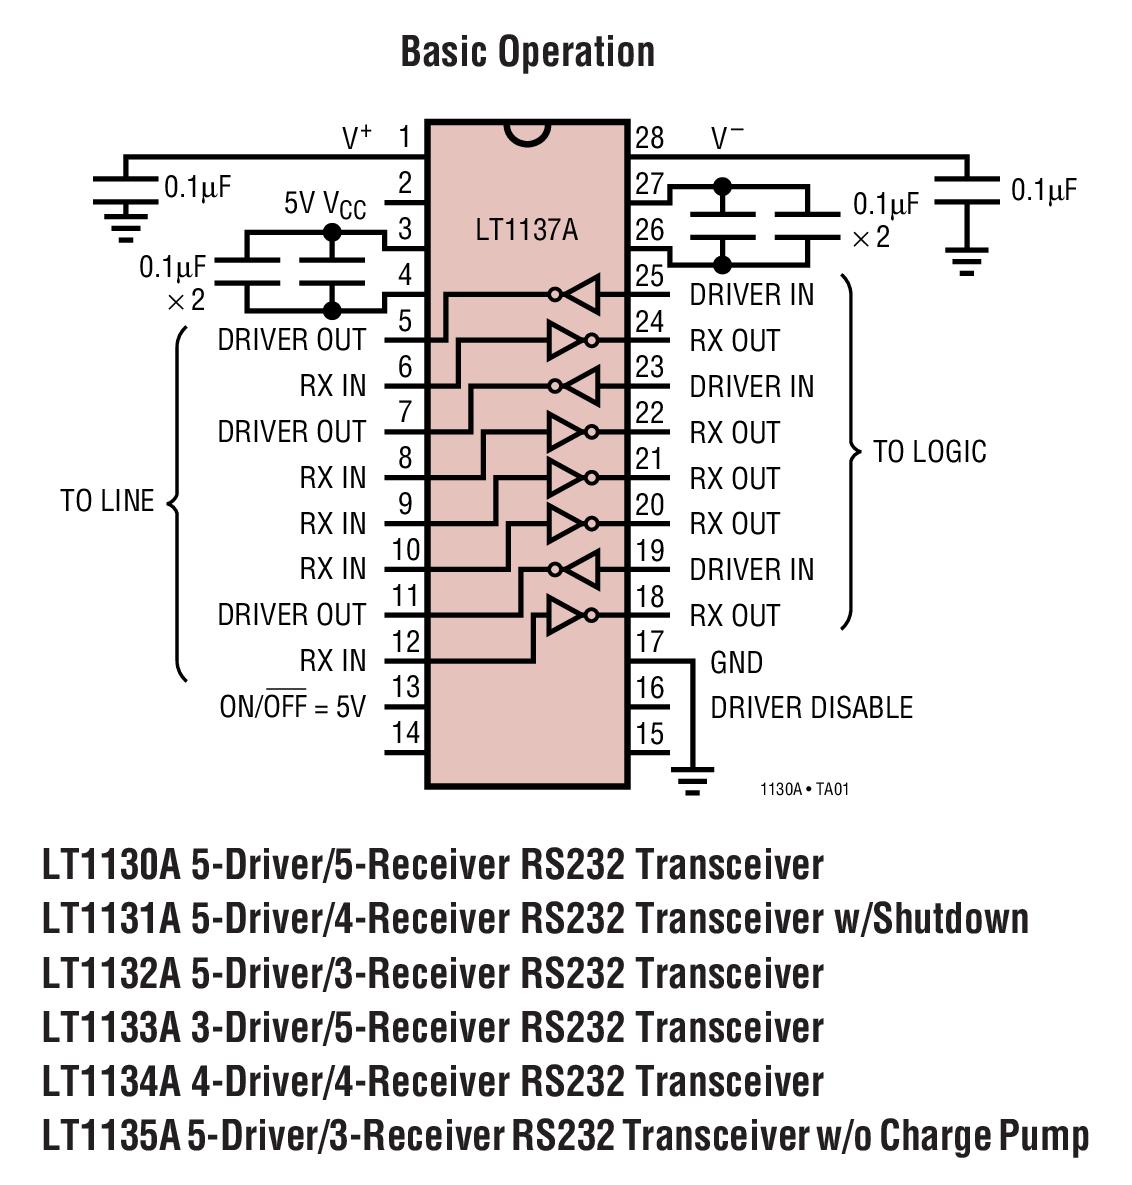 LT1141A 采用小電容器的先進低功率 5V RS232 驅動器 / 接收器